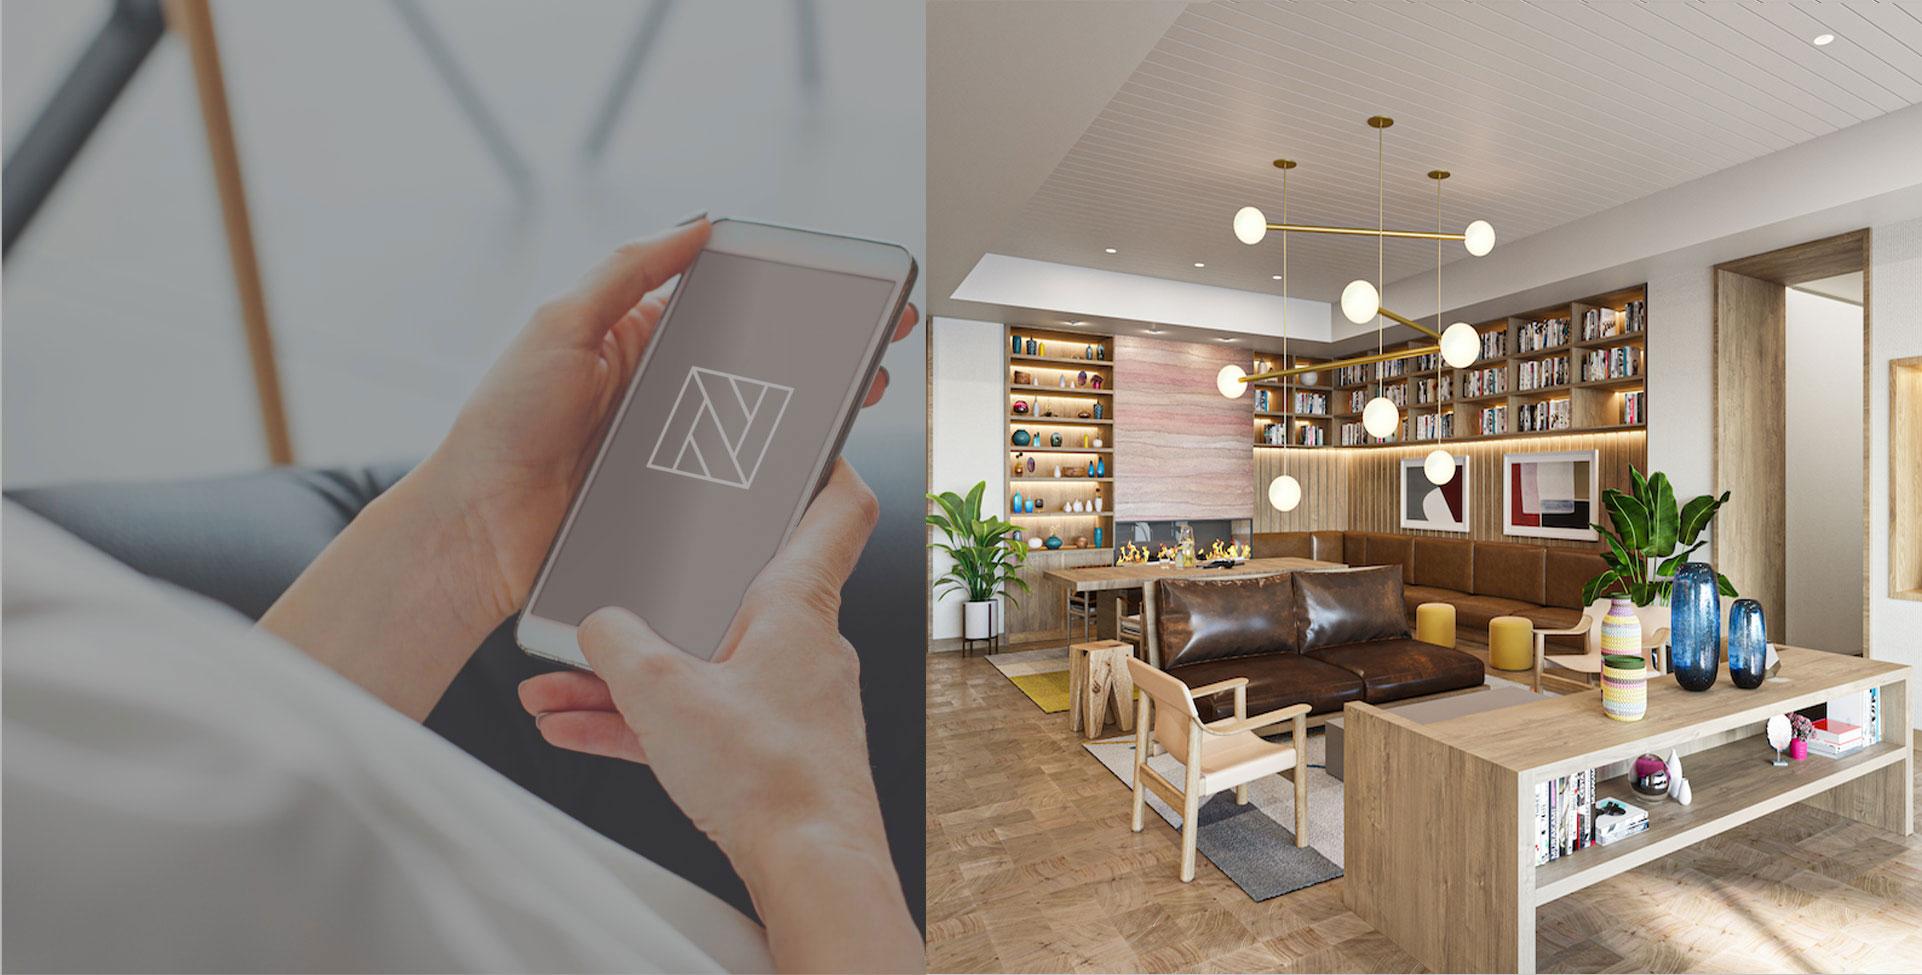 Natiivo Austin's 24/7 concierge service and lobby area